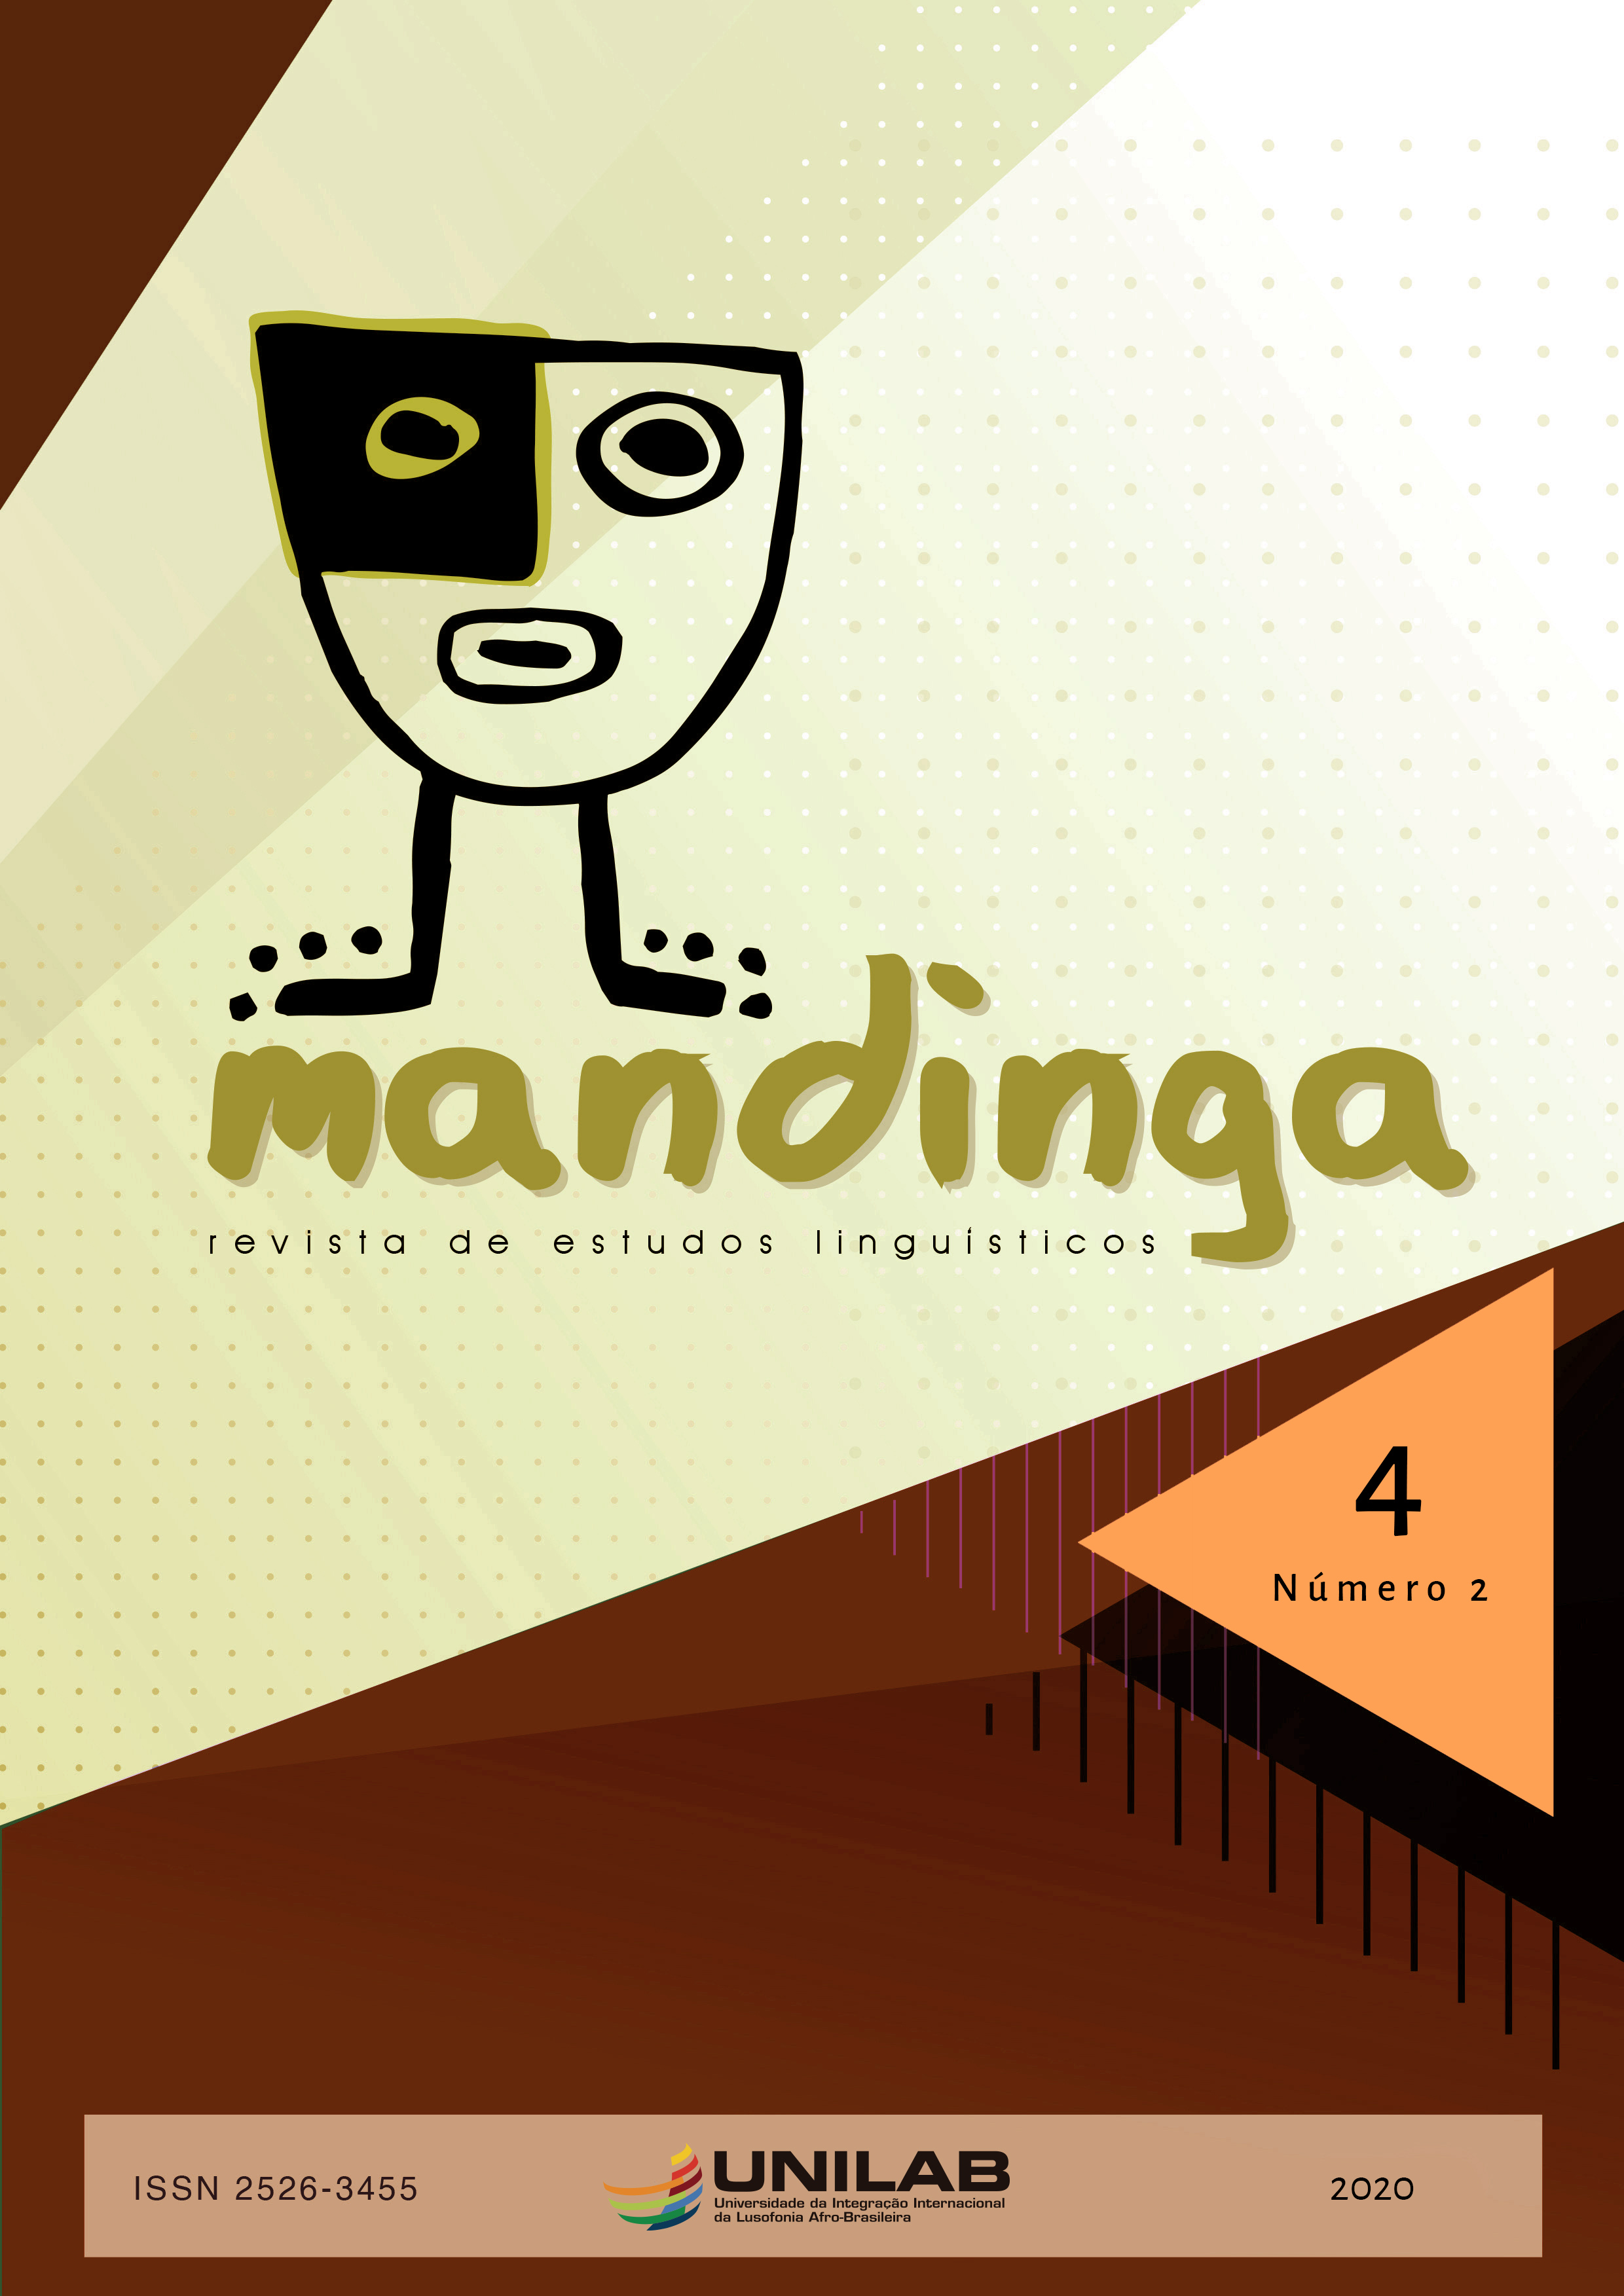 Visualizar v. 4 n. 2 (2020): Mandinga